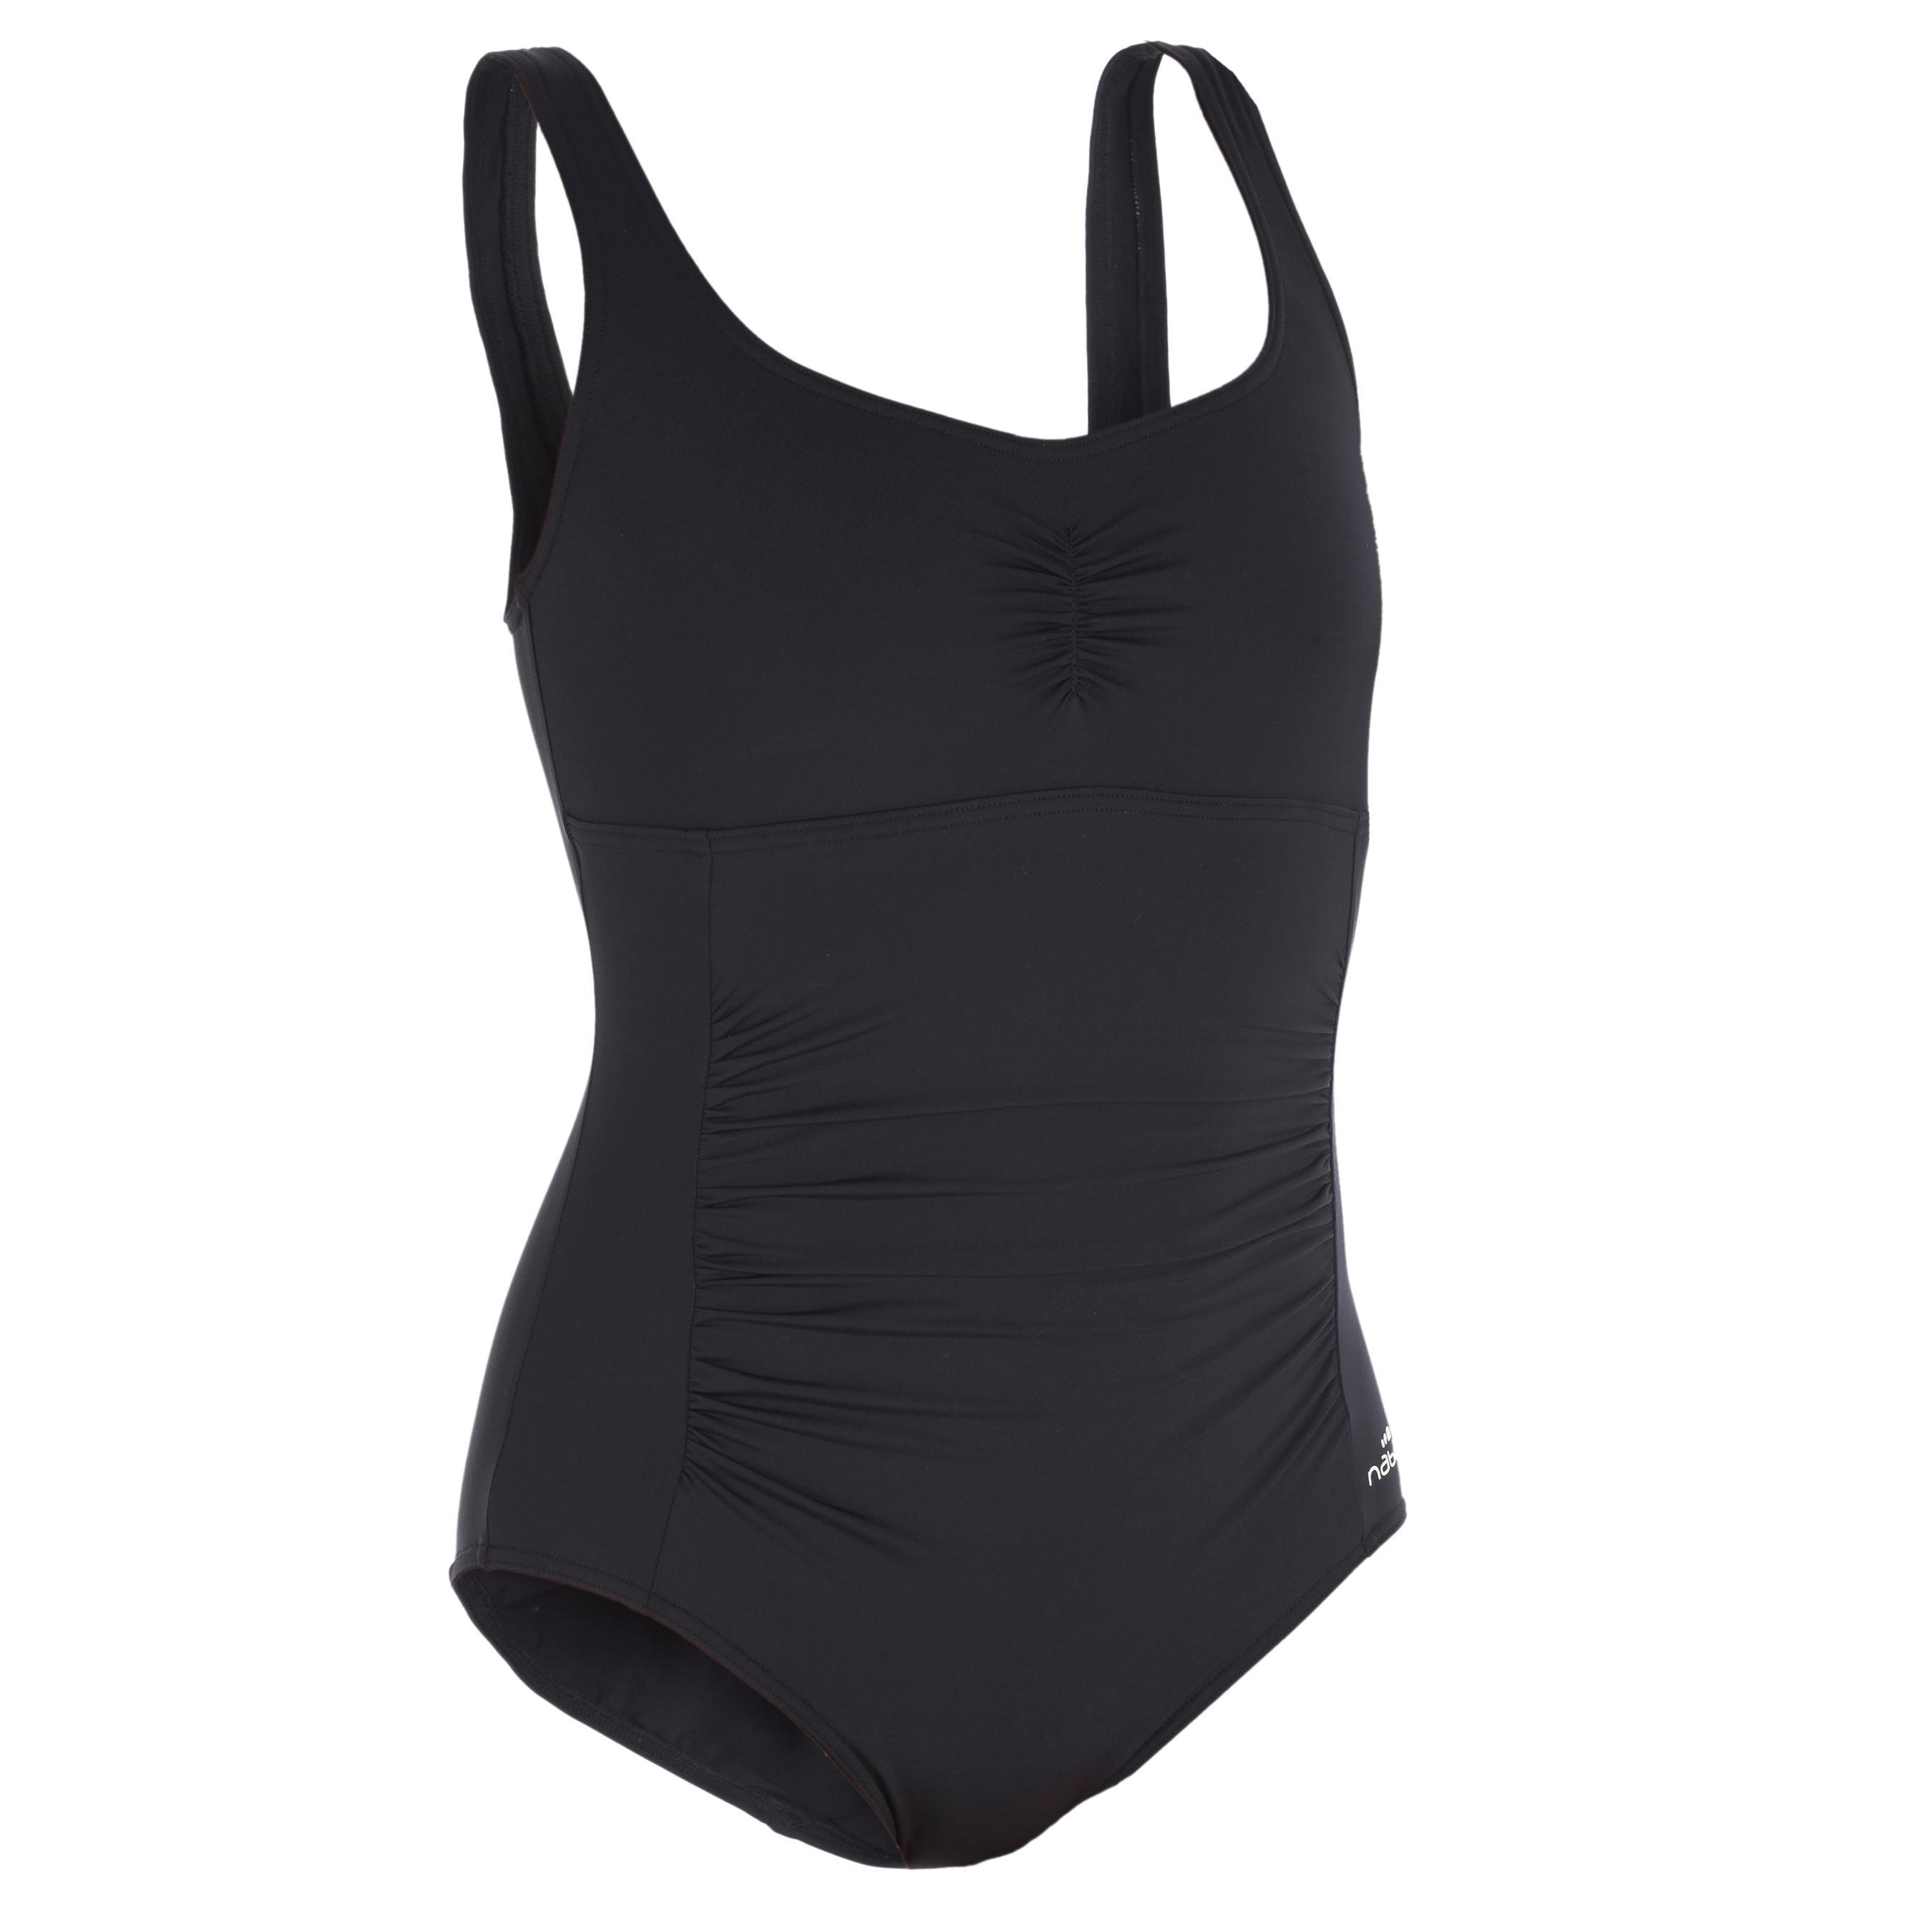 Mary One-Piece Women's Body-Sculpting Aquatfitness Swimsuit - Black